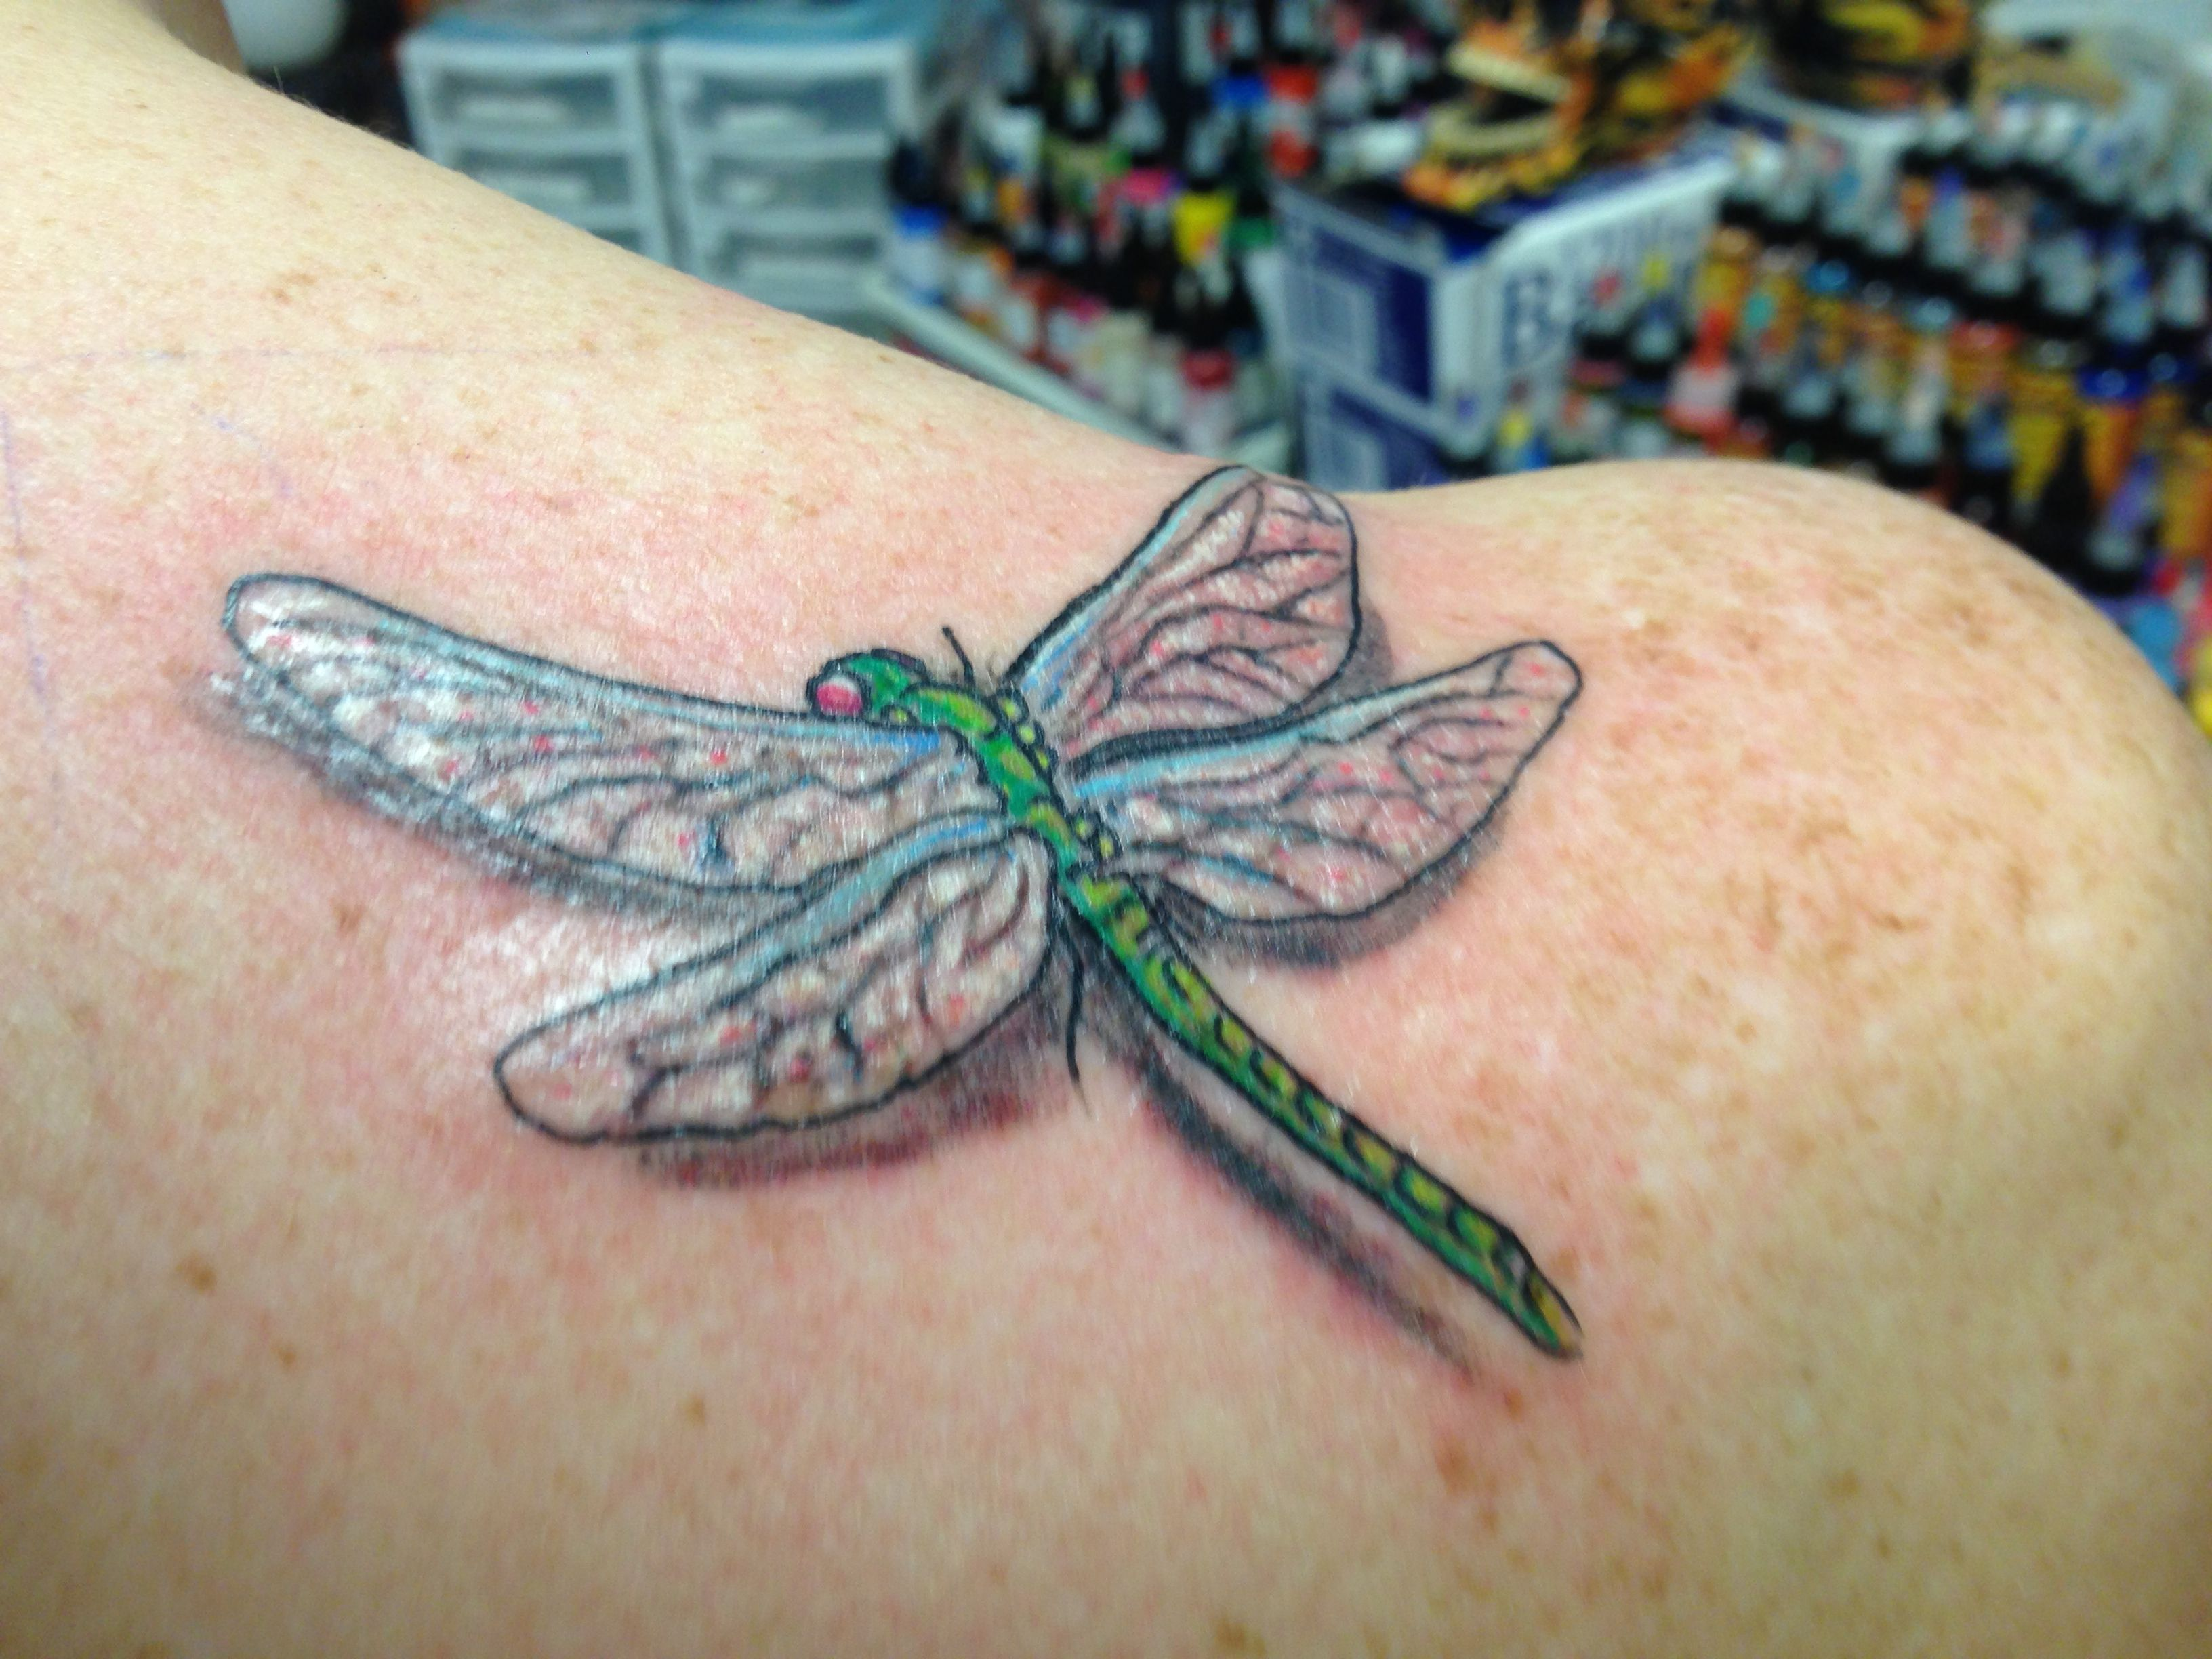 Dragonfly tattoo 3D  Ink Ideas  Pinterest  Dragonflies, Tattoo and Tatoos